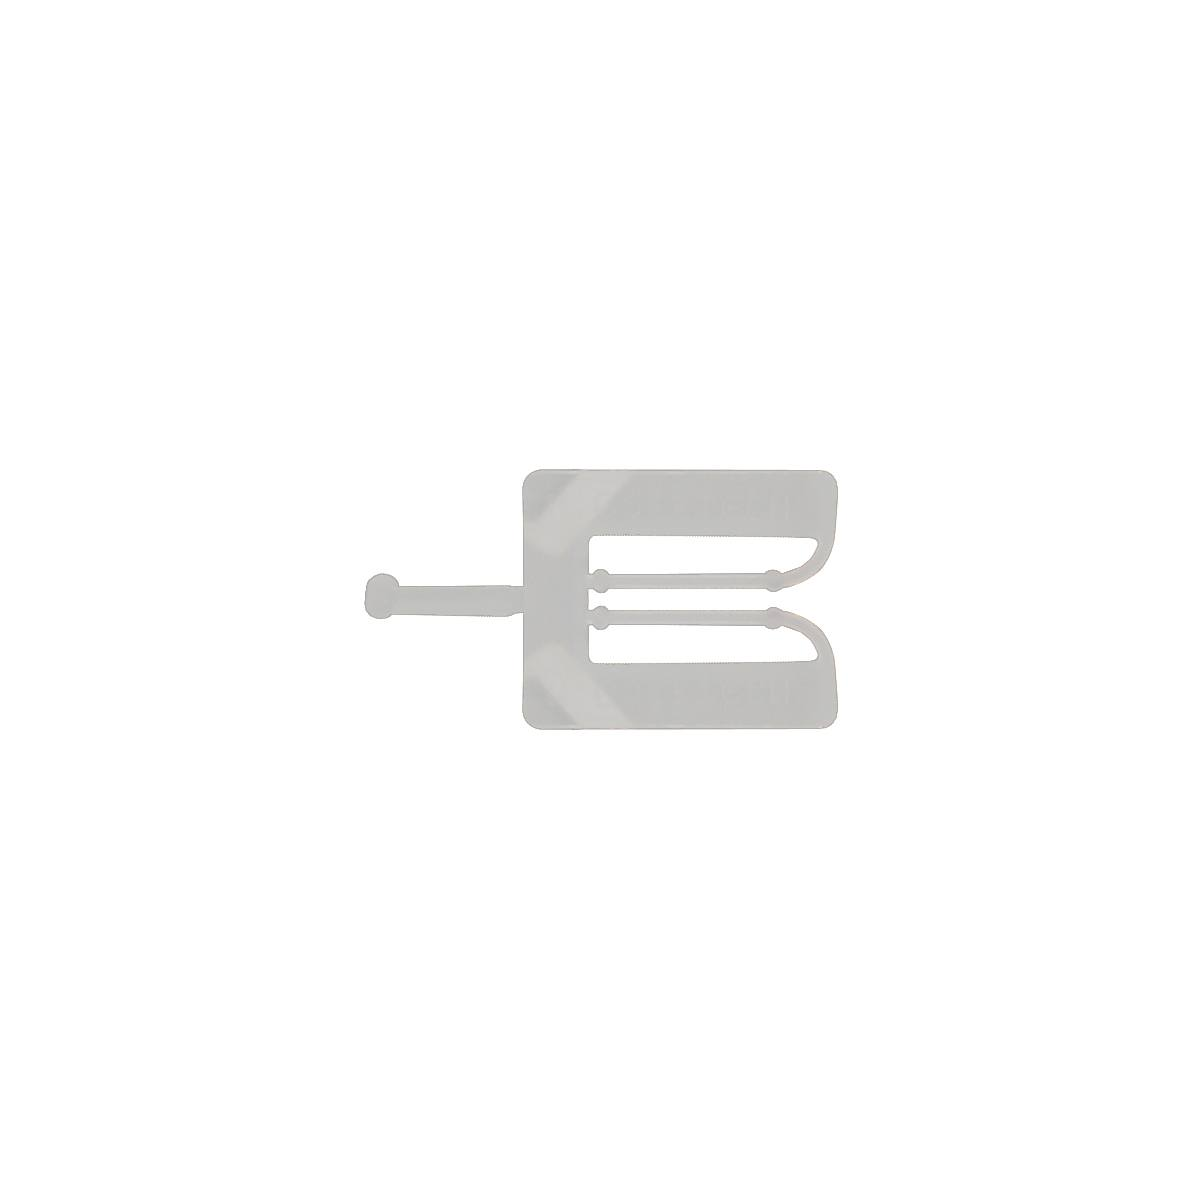 SACHET 1000 CALES KLIC-CLAC 2 MM